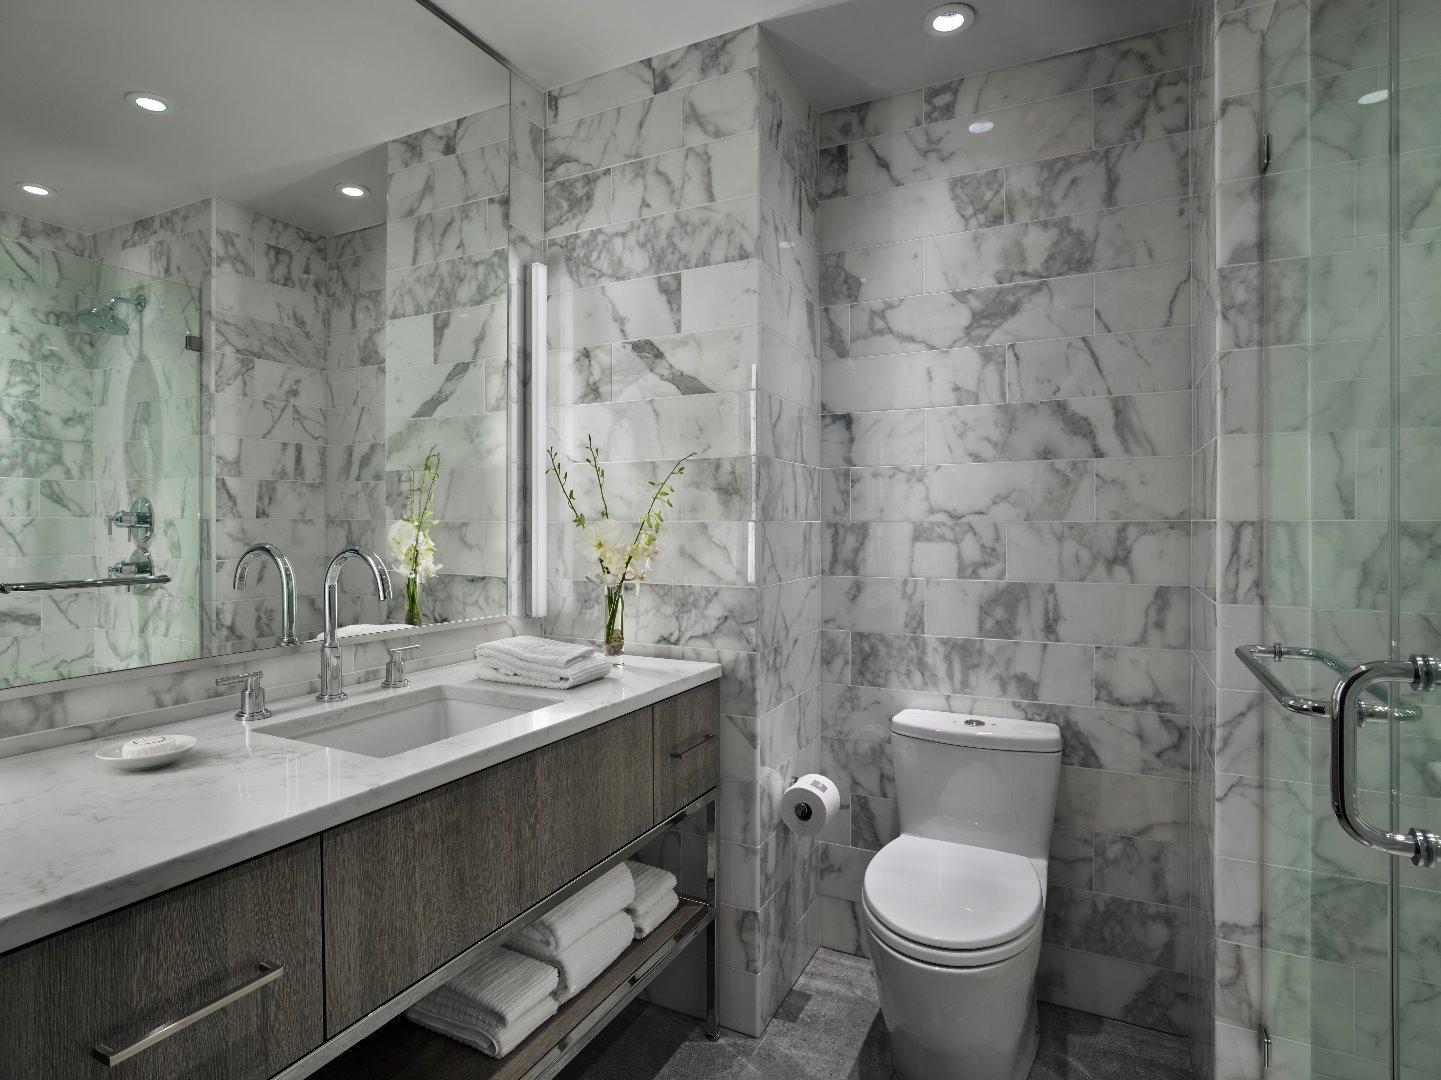 Bathroom at AKA White House, Centre, Washington DC